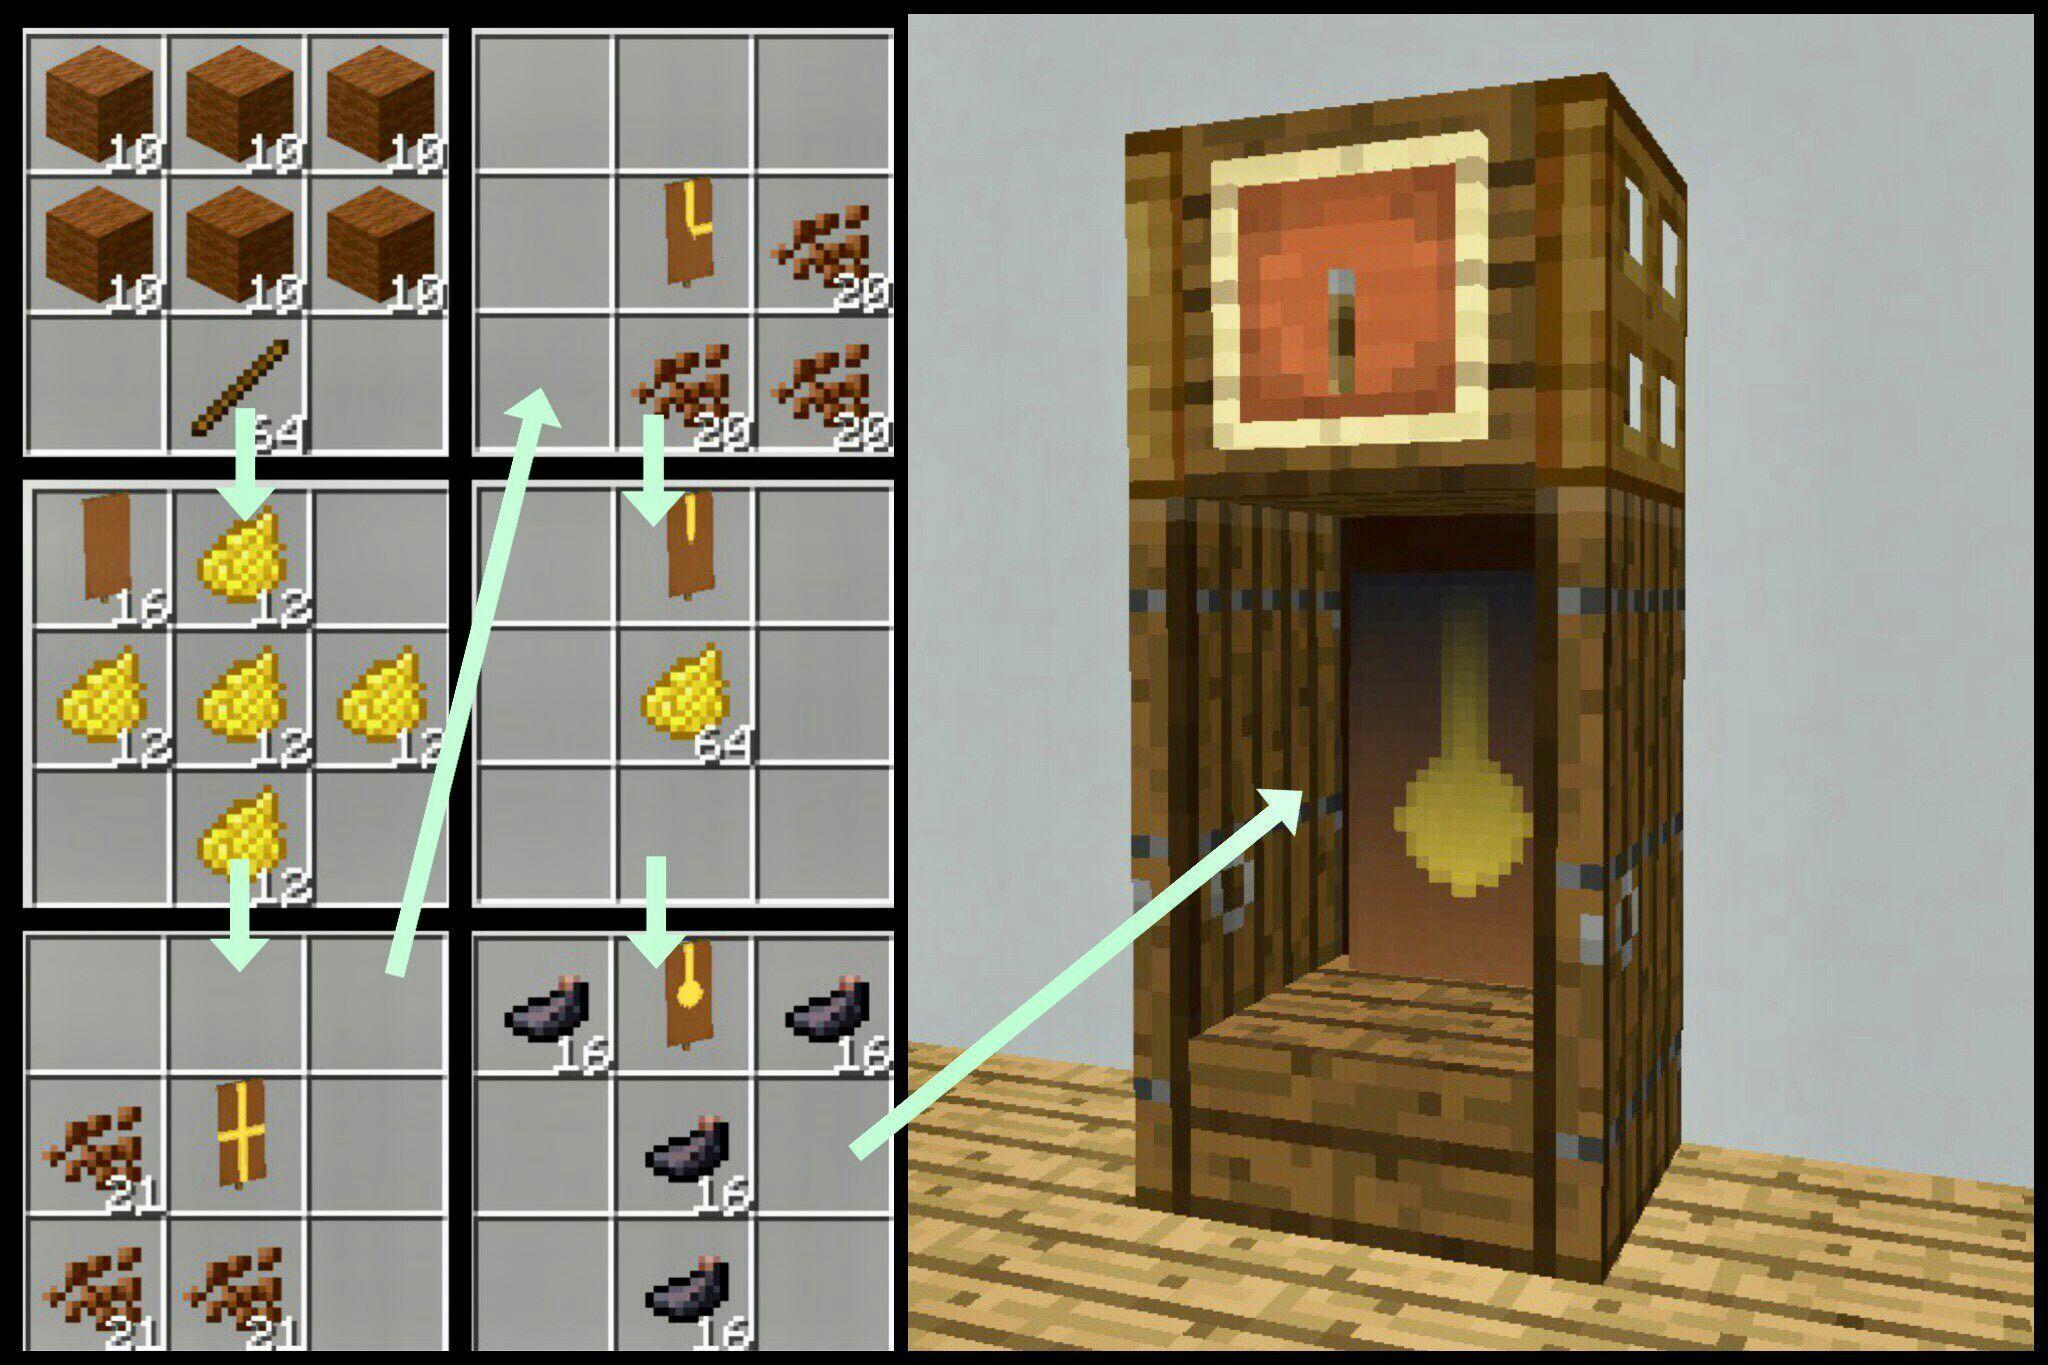 Grandfather clock design Minecraftfurniture minecraft